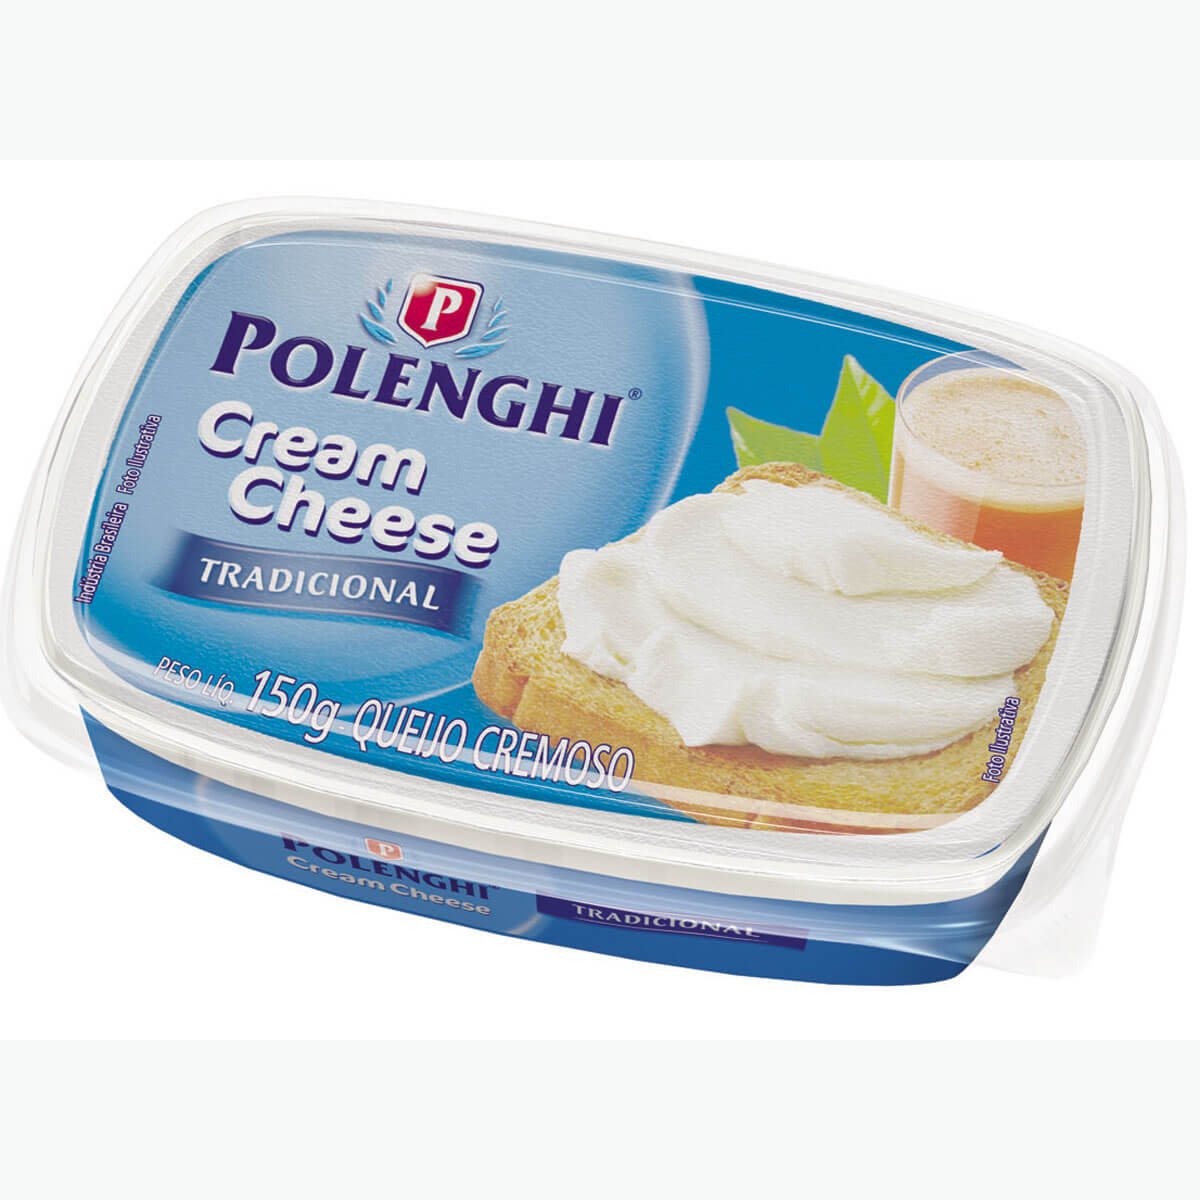 CREAM CHESE POLENGHI CX C/ 4X1,5 KG